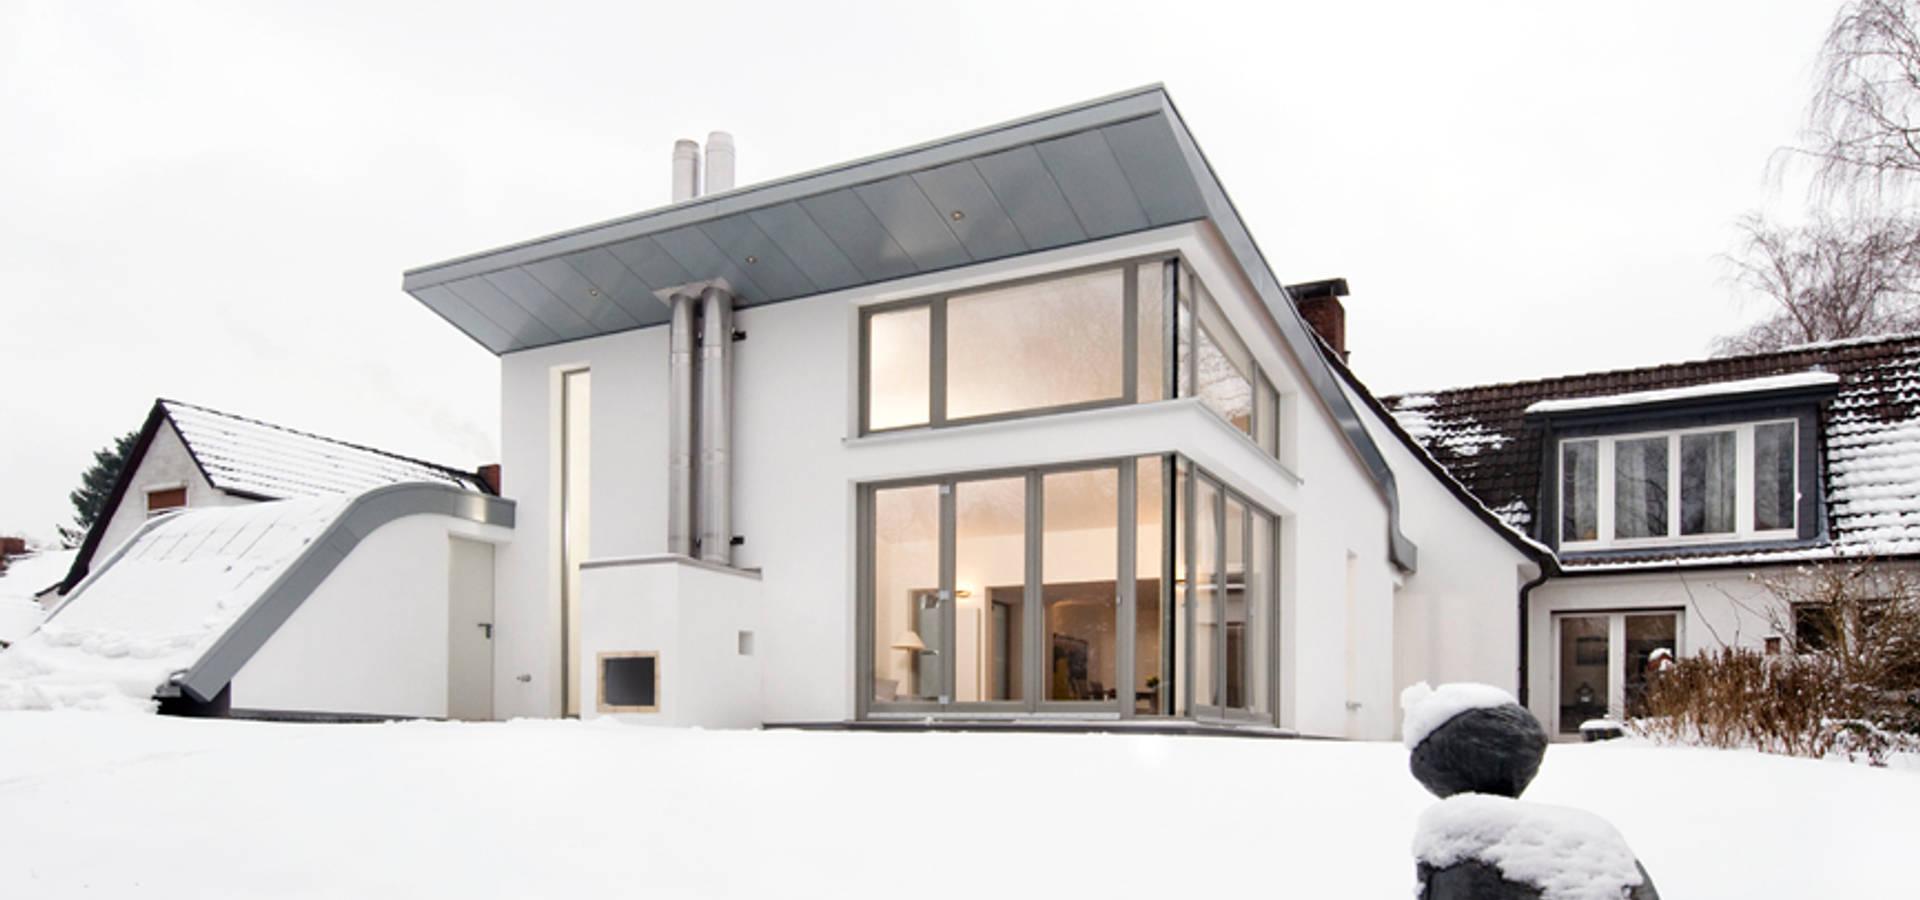 and8 Architekten Aisslinger + Bracht